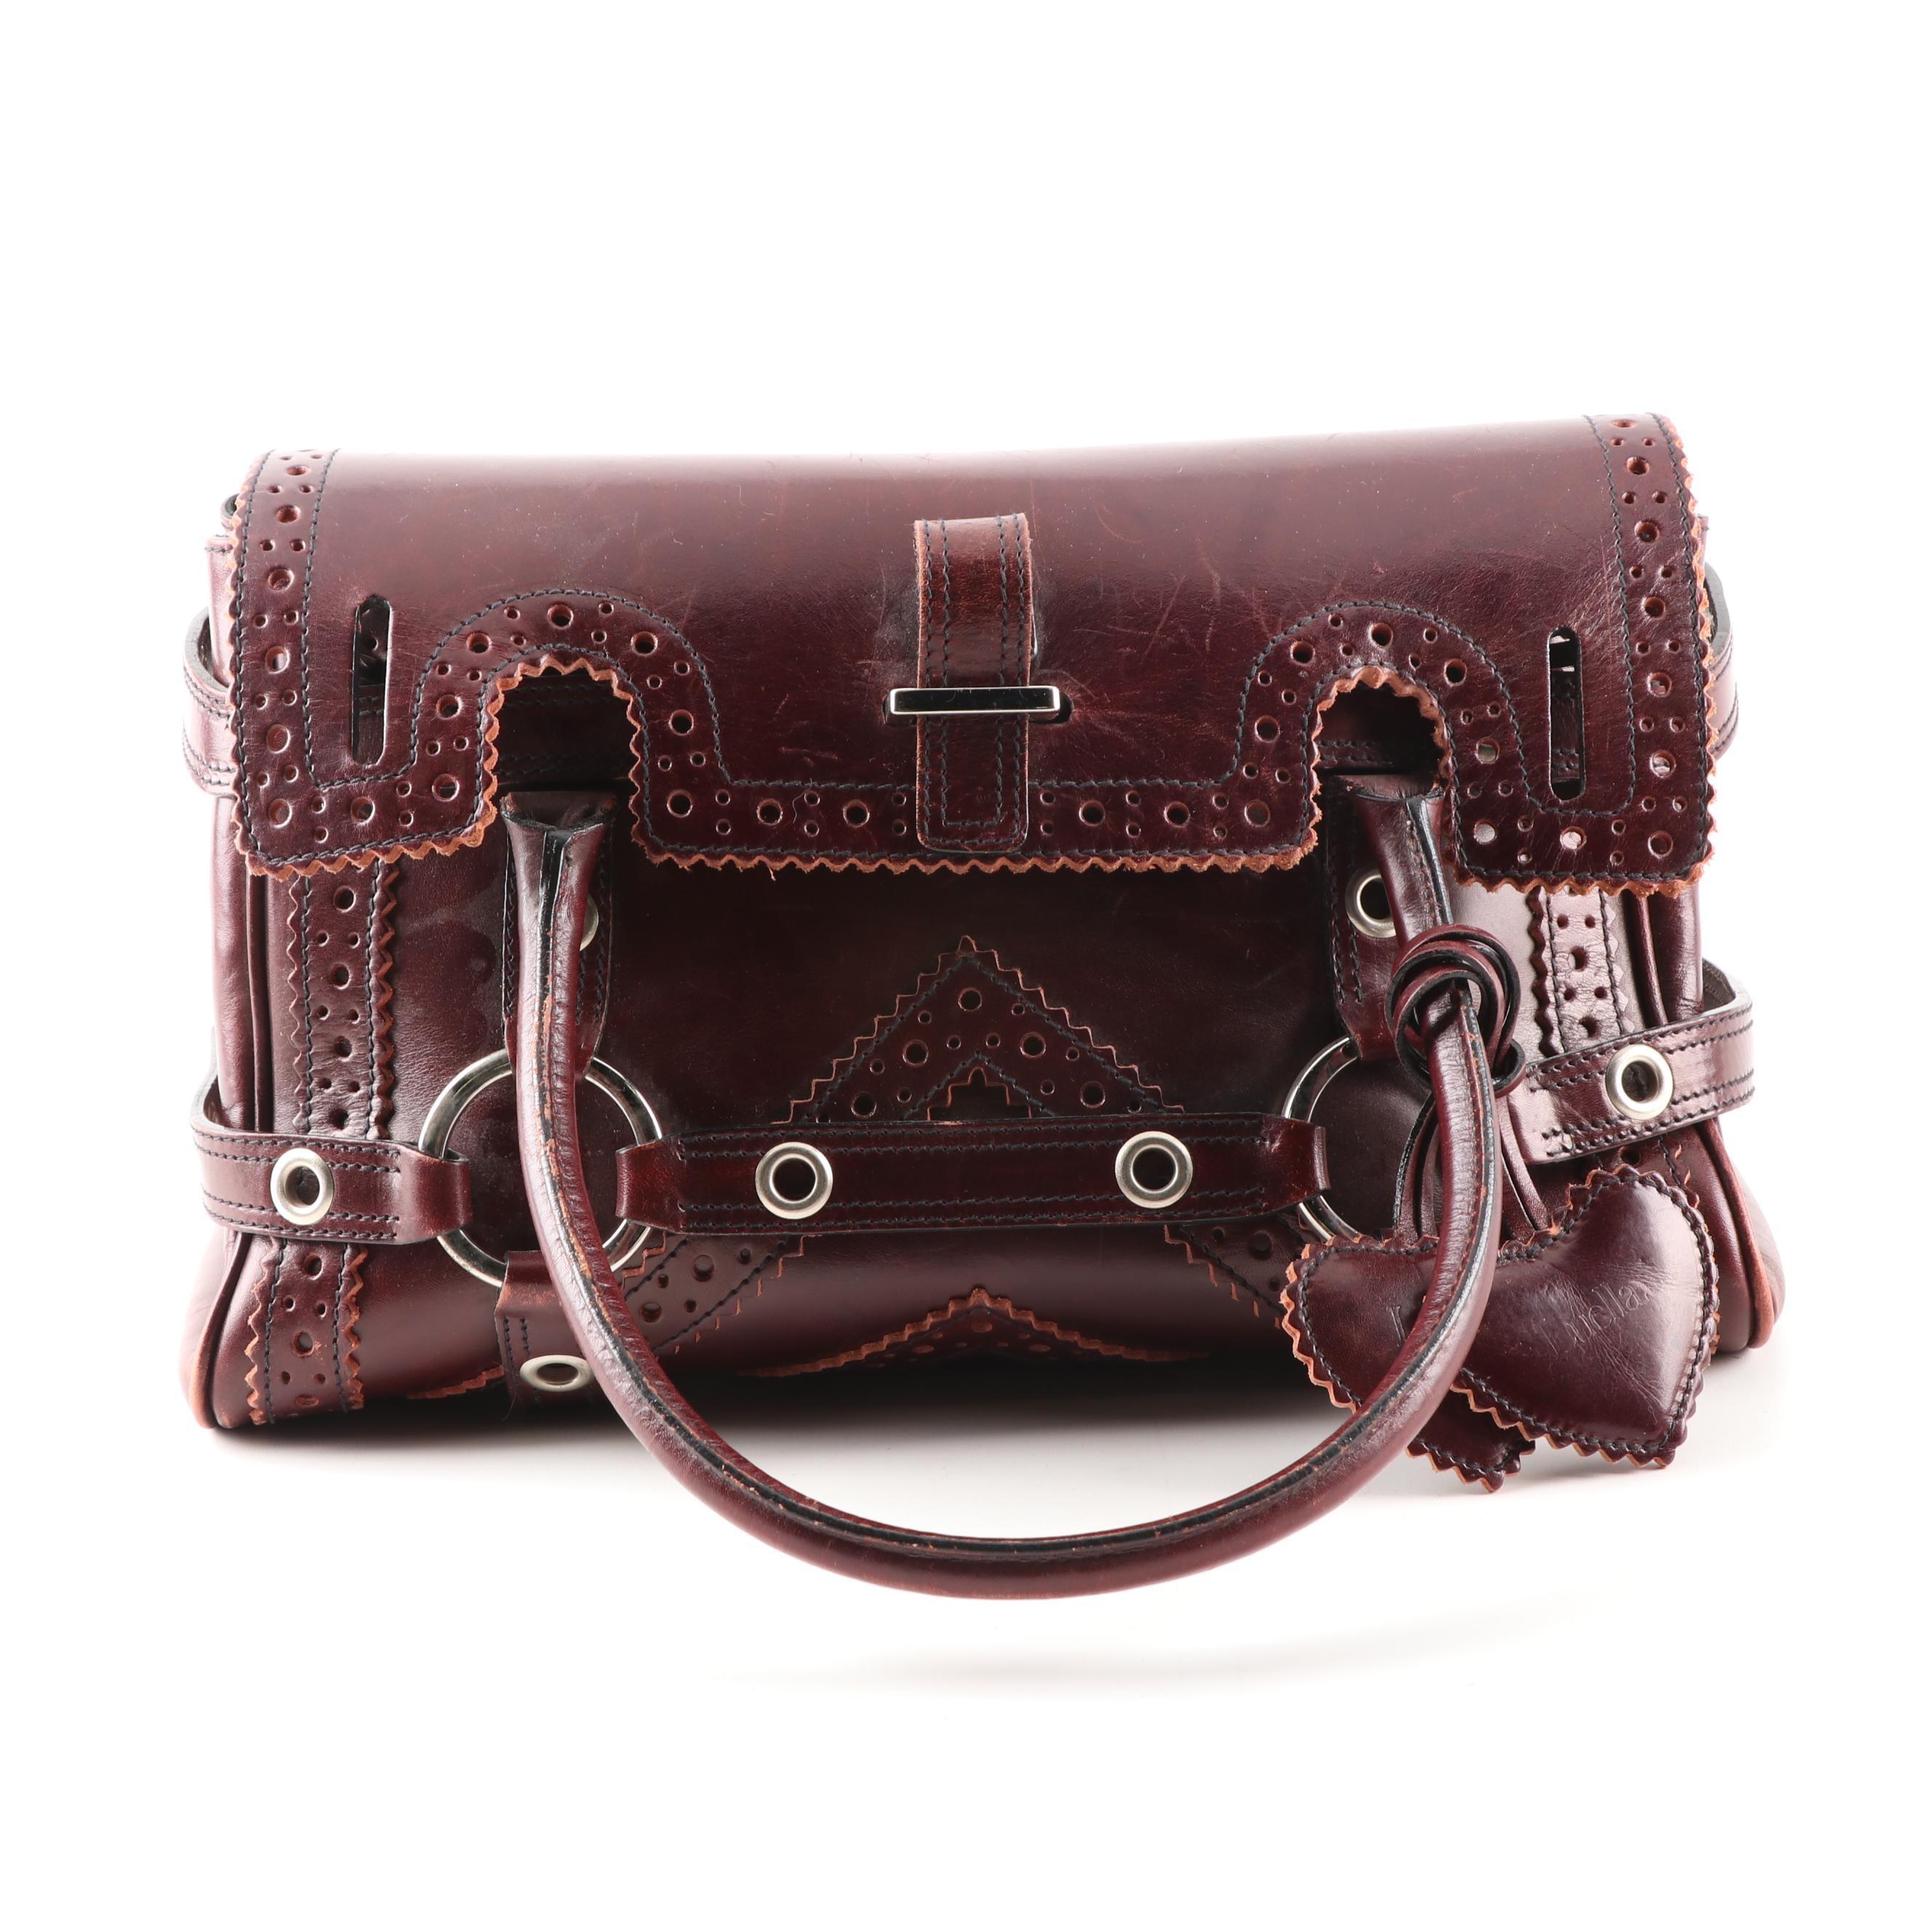 Luella Mahogany Leather Satchel Bag